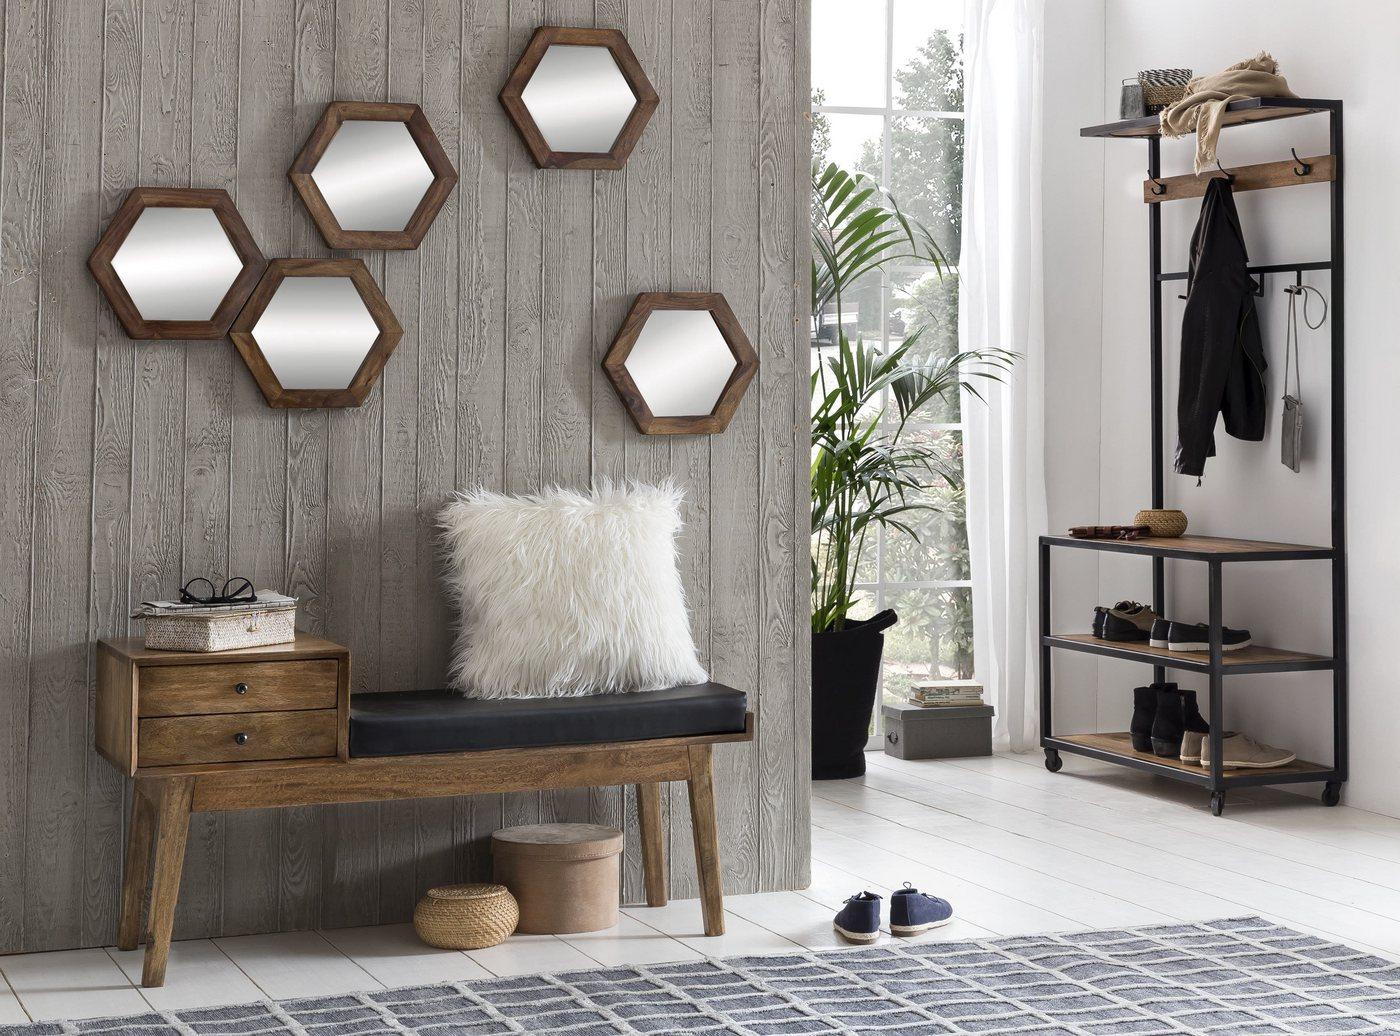 Garderobe »Panama«, Material Metall, Holz, SIT-Möbel günstig online kaufen